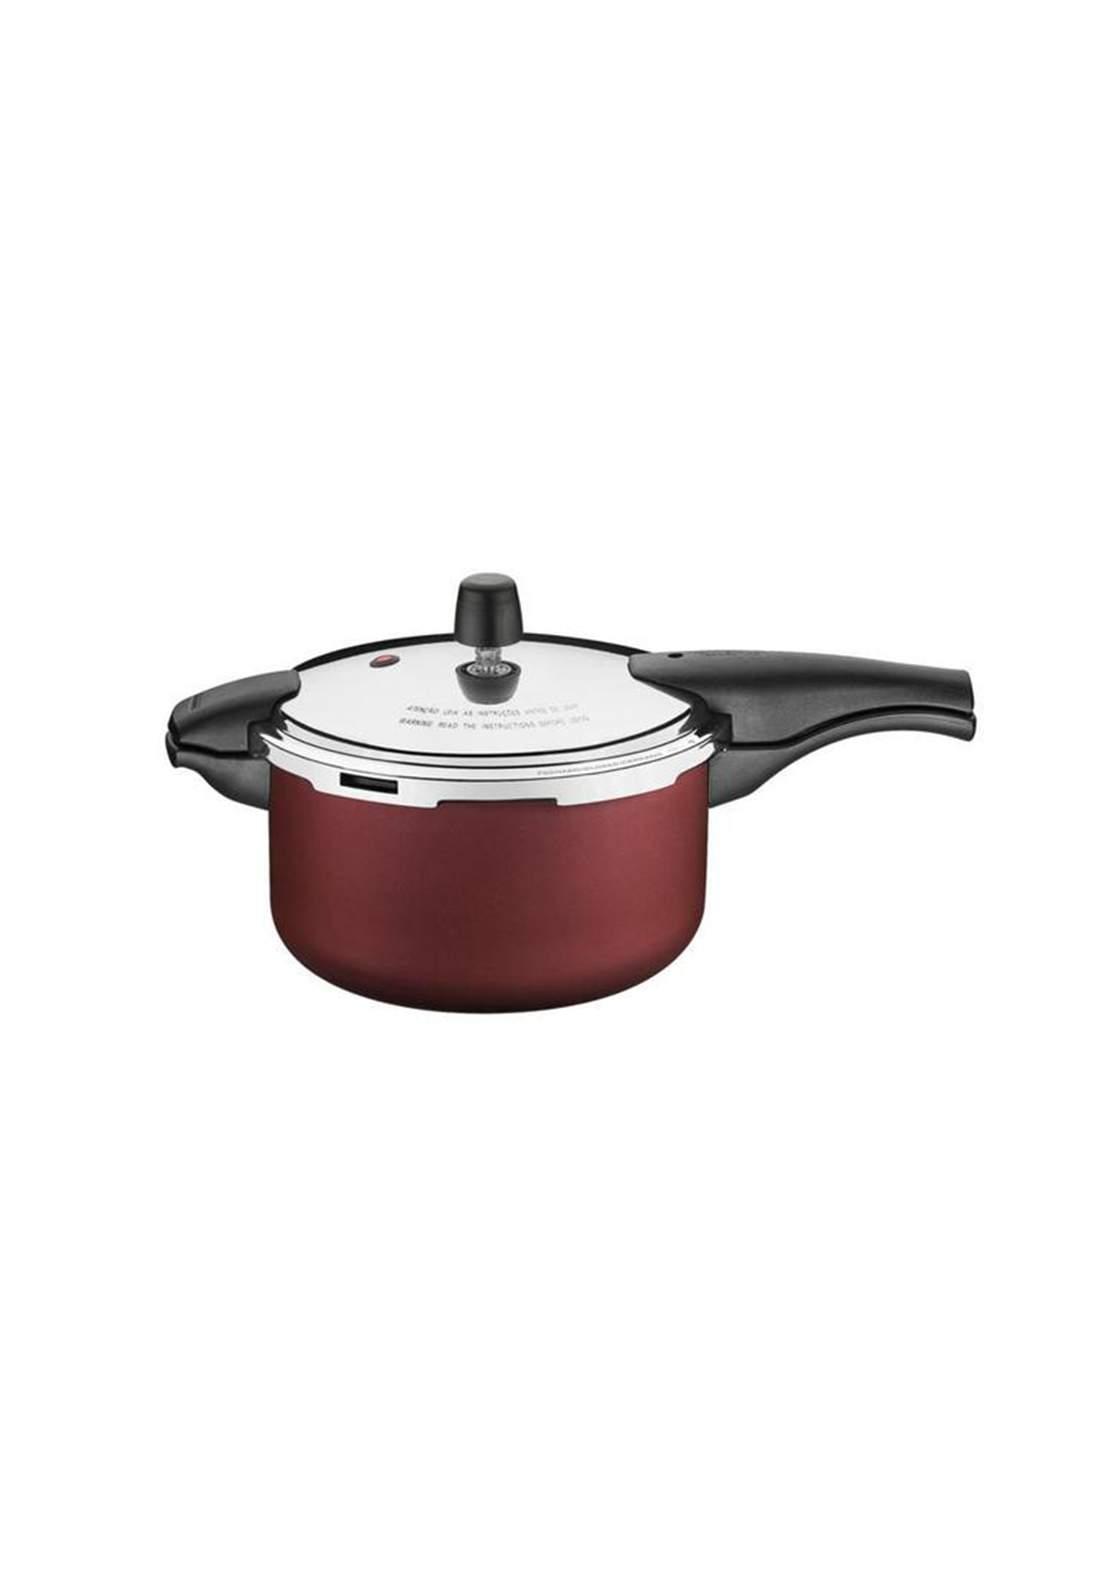 Tramontina '20589-724 Pressure Cooker 6 L Red قدر ضغط